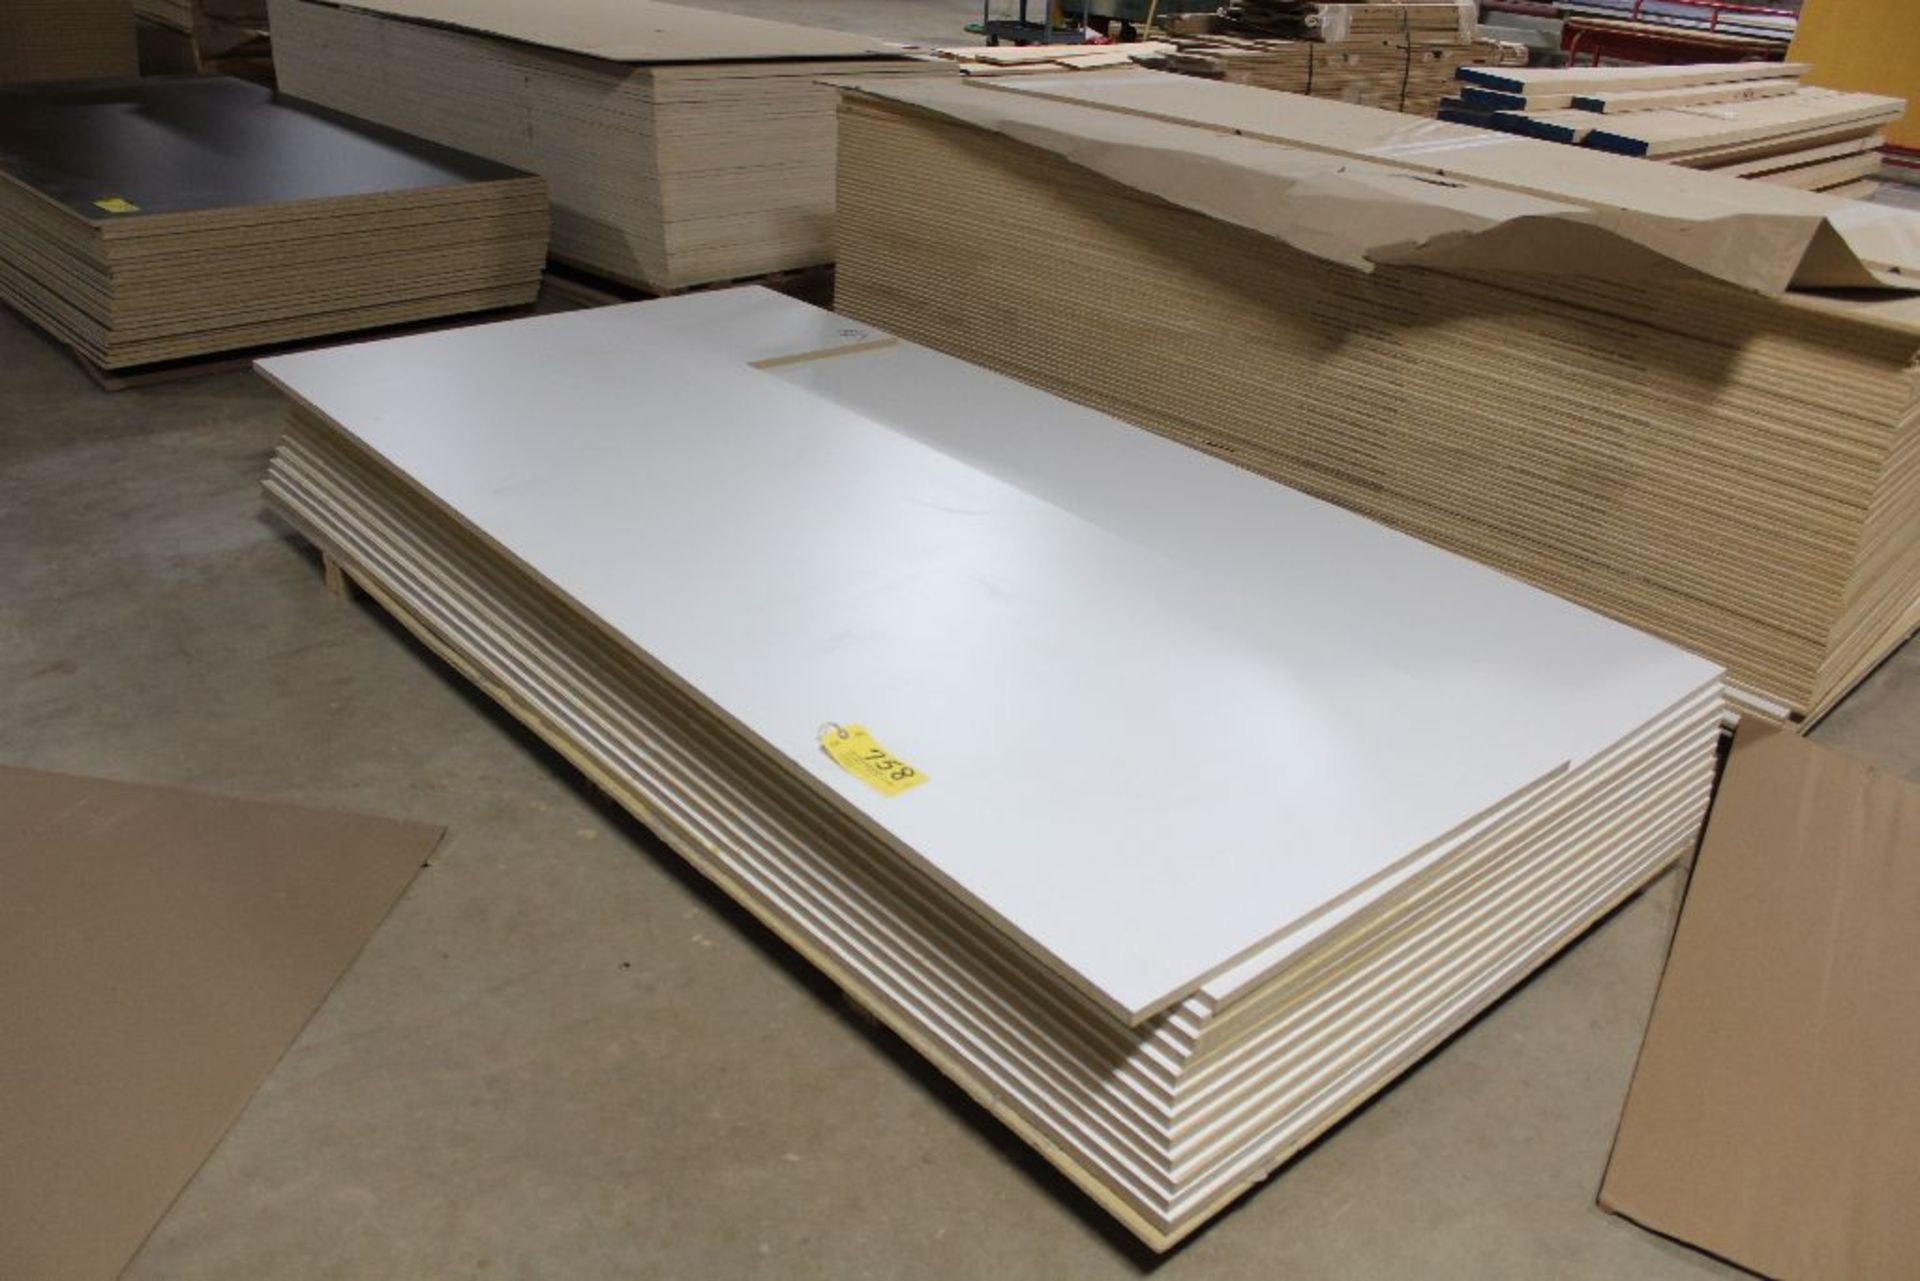 "Lot 758 - Lumber, (12) MDF white 2 sided, 3/4"" x 49"" x 97""."